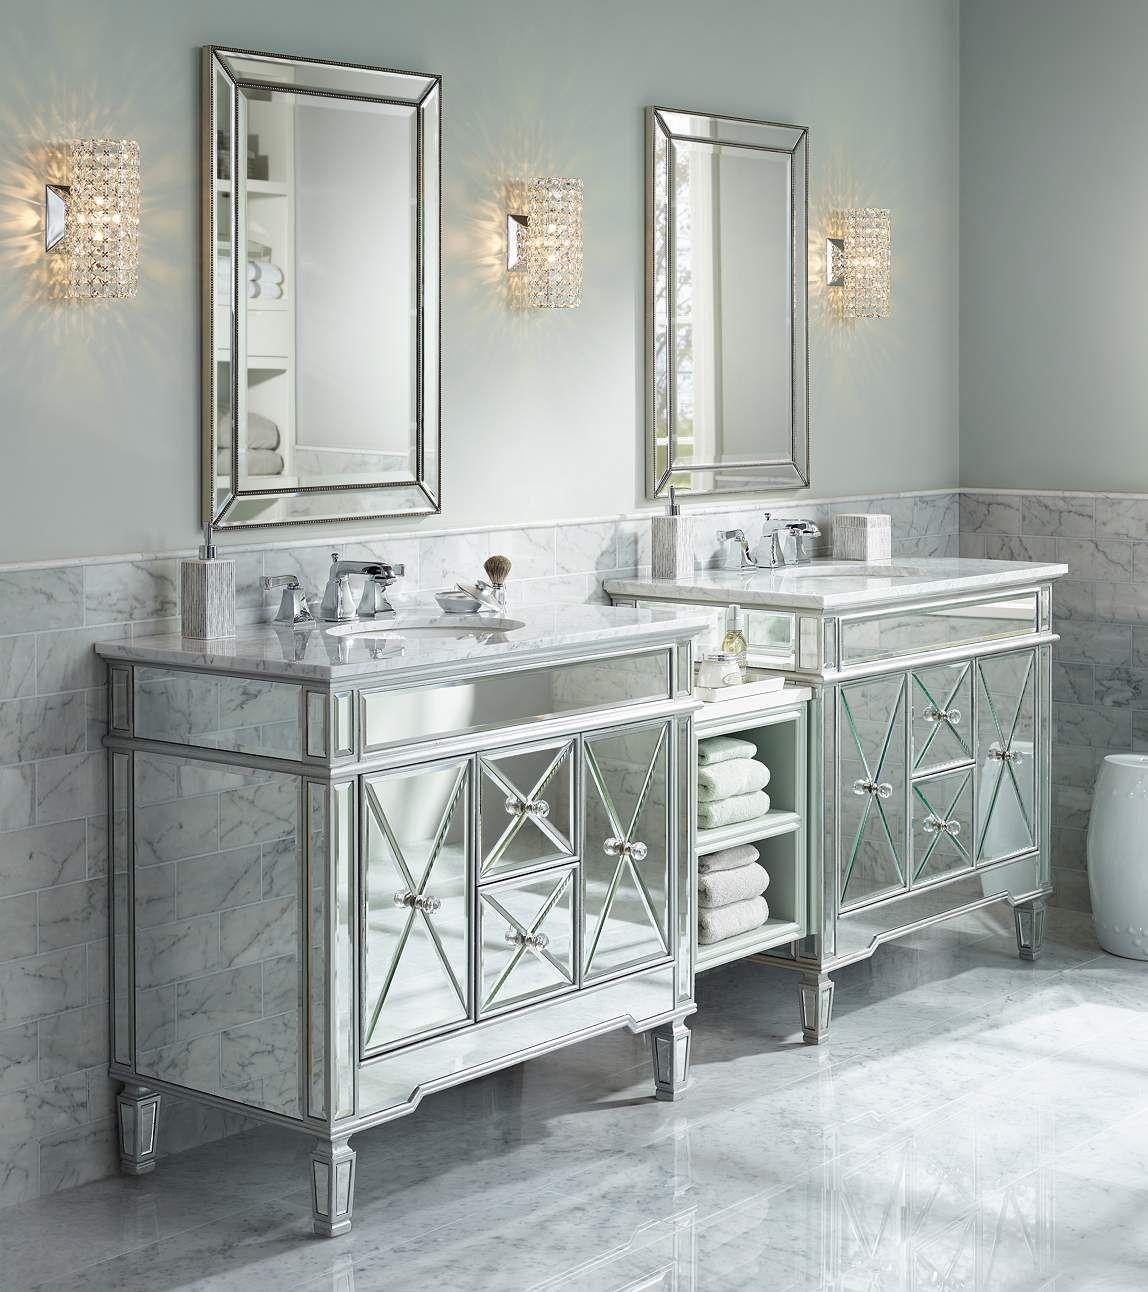 "Crystal Cylinder 10 1/4"" High Wall Sconce - #Y6859 | Lamps ... on Crystal Bathroom Sconces id=65538"